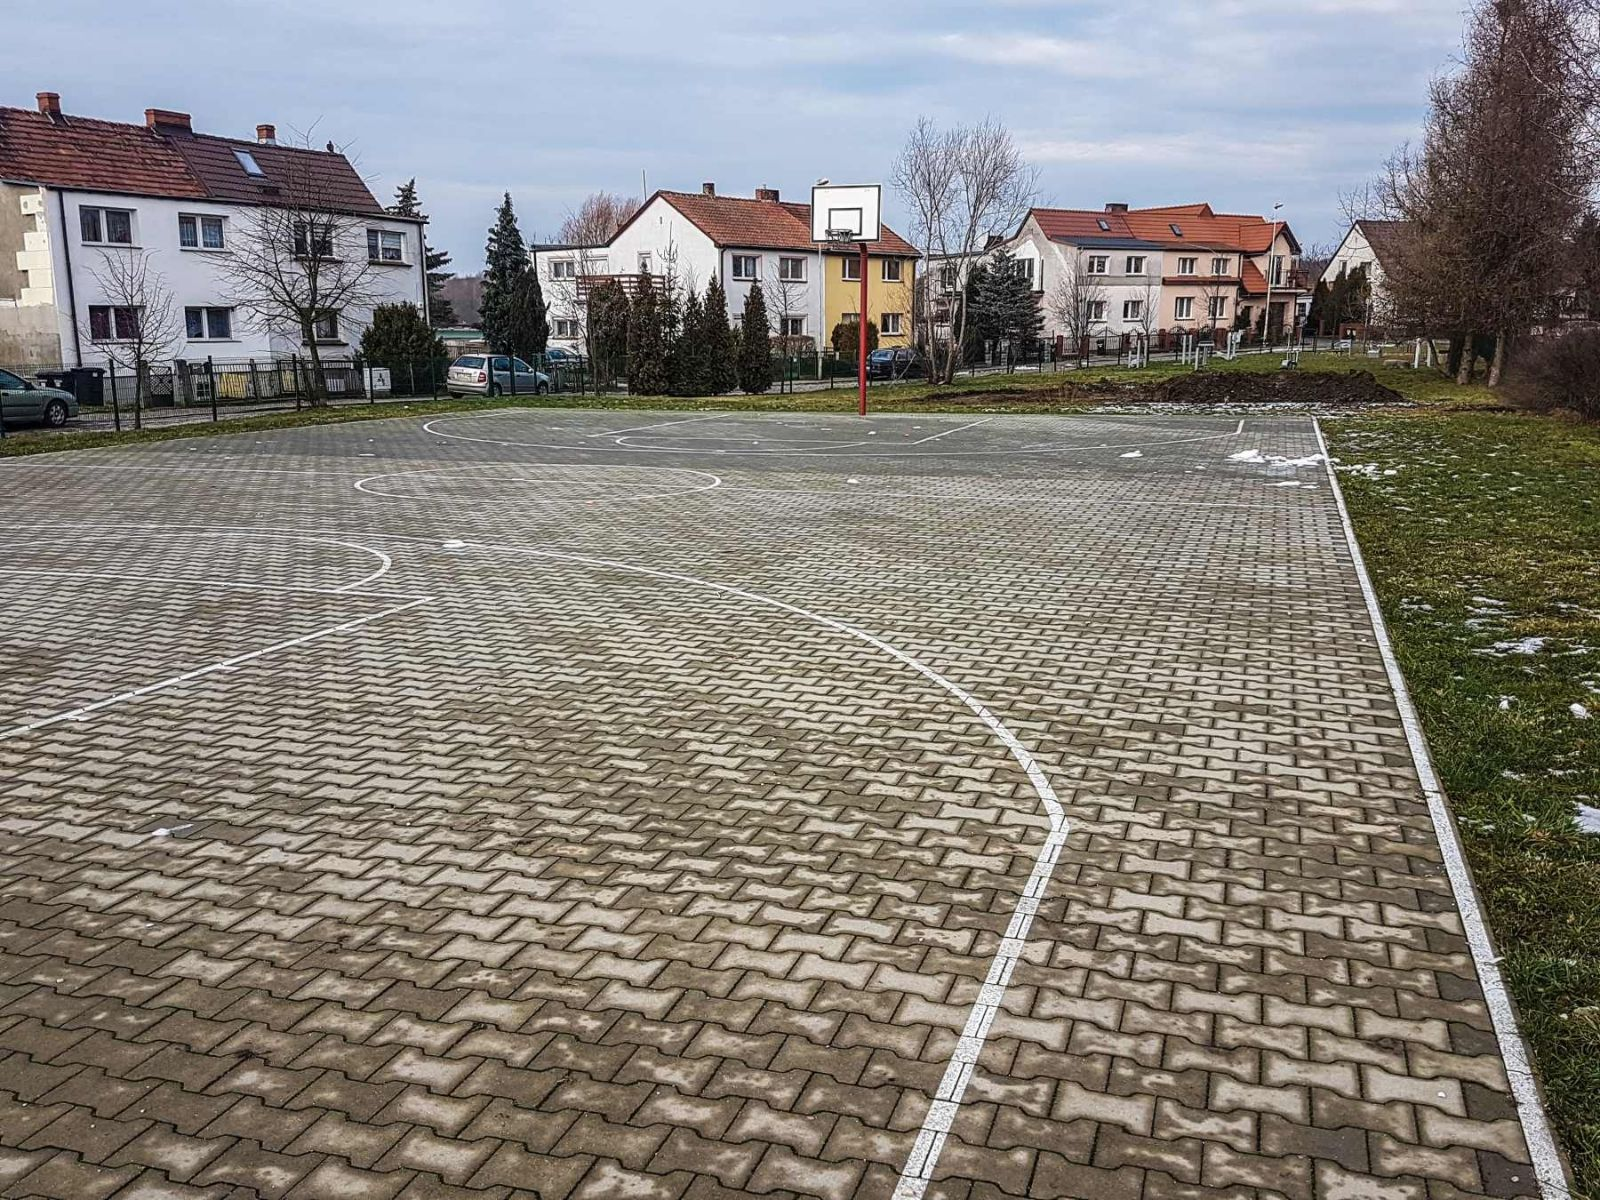 teren rekreacyjny ulica Okólna